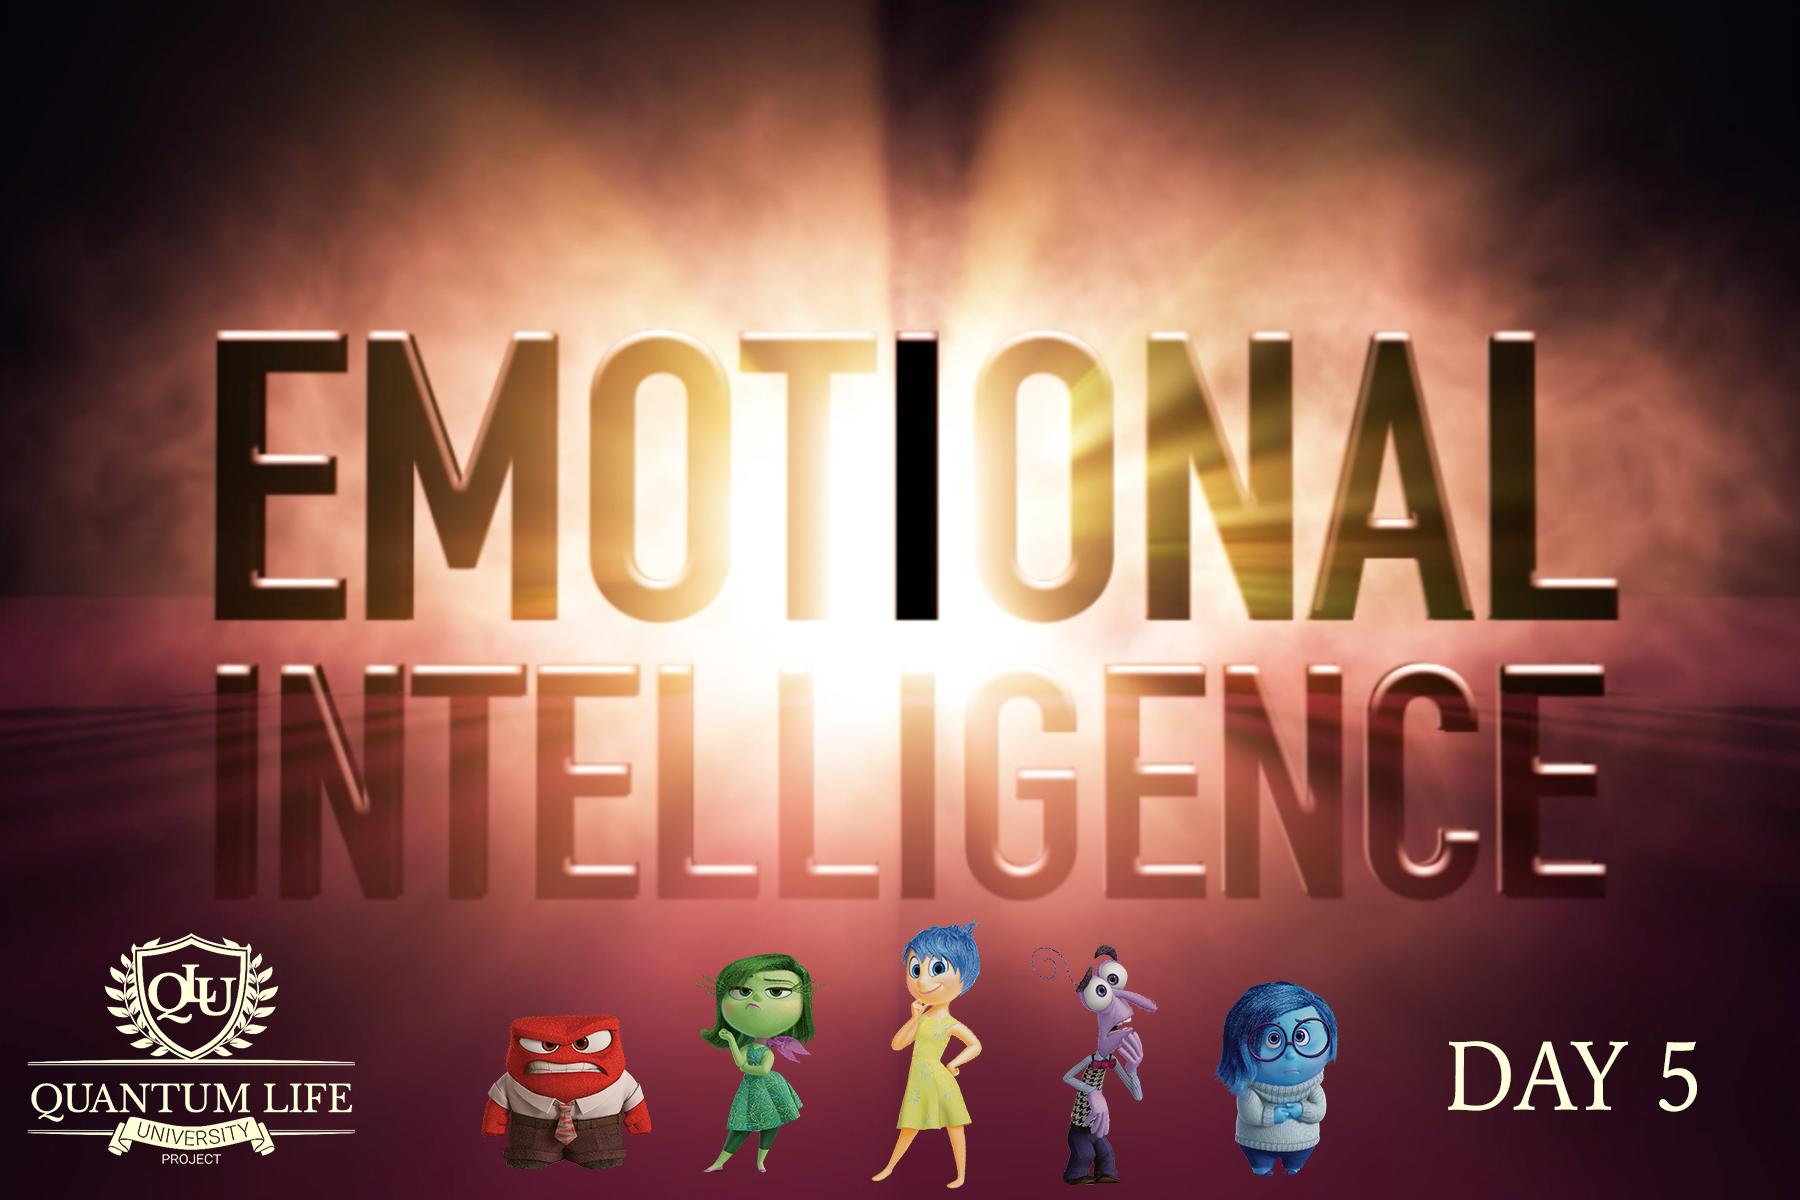 Emotional Intelligence Course day 5